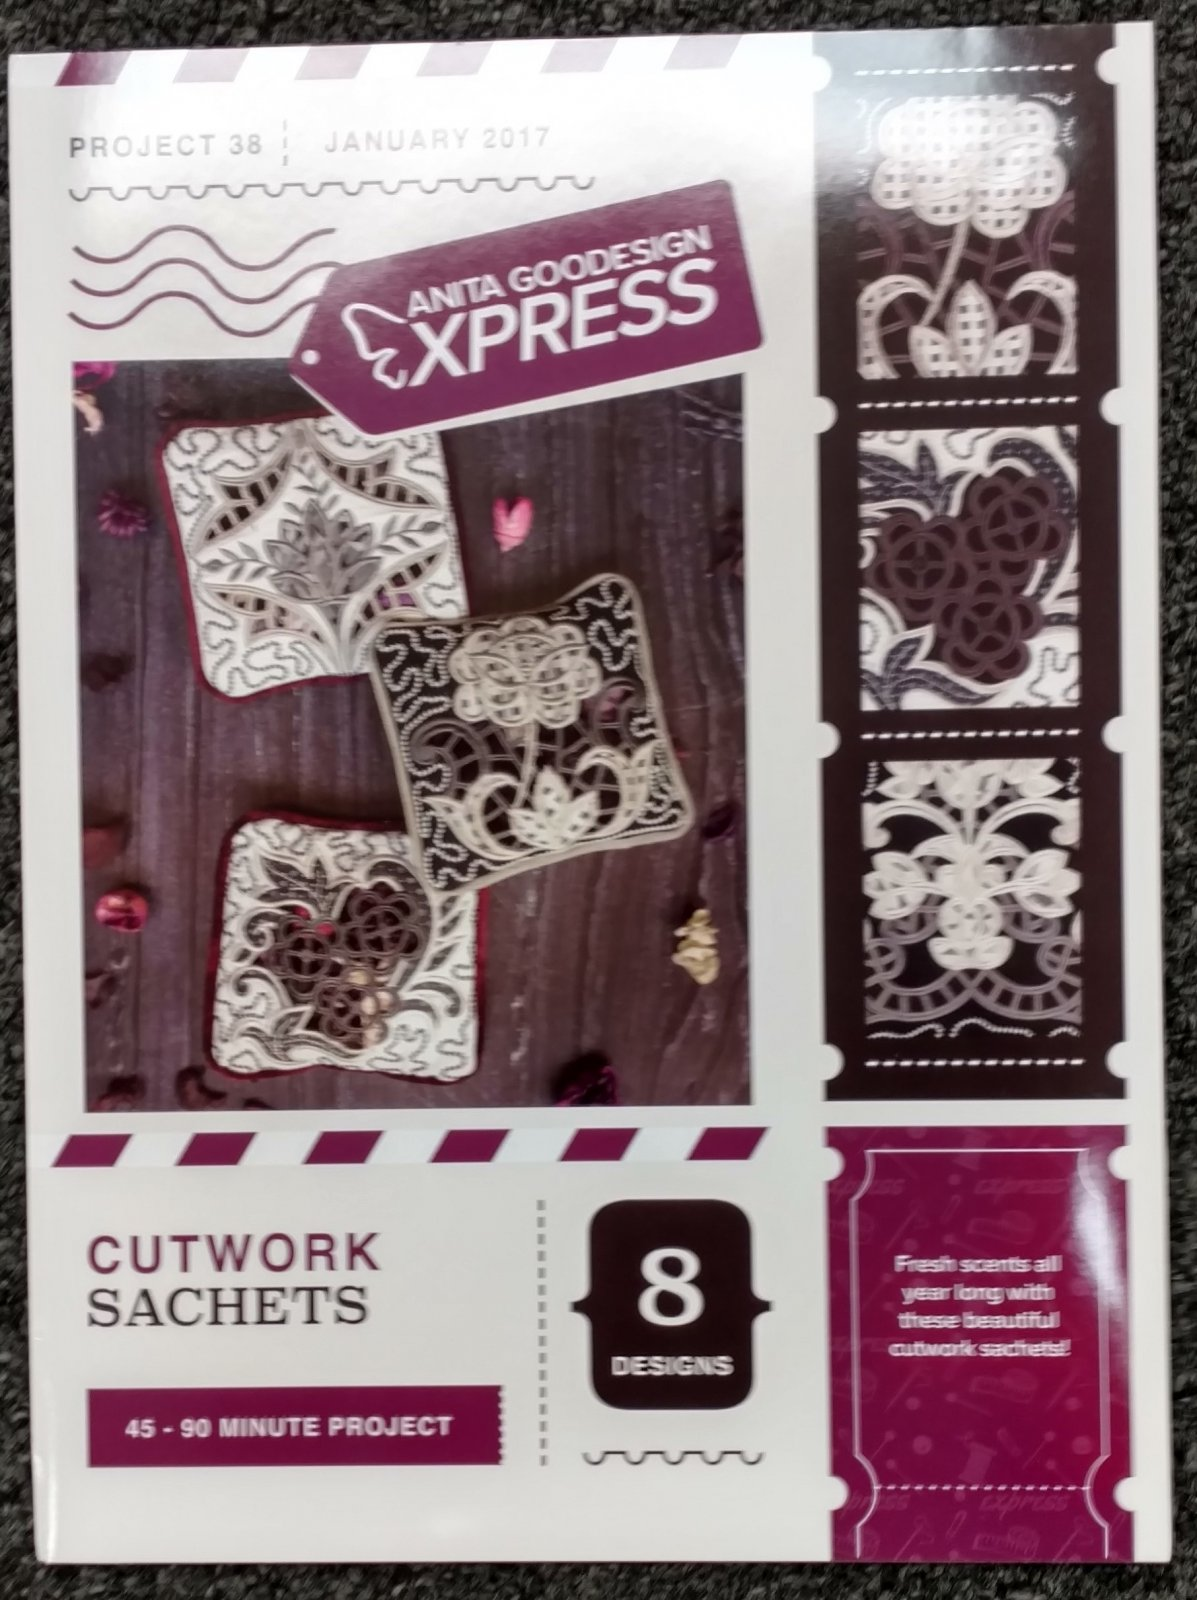 Cutwork Sachets - Anita Goodesigns Express projects